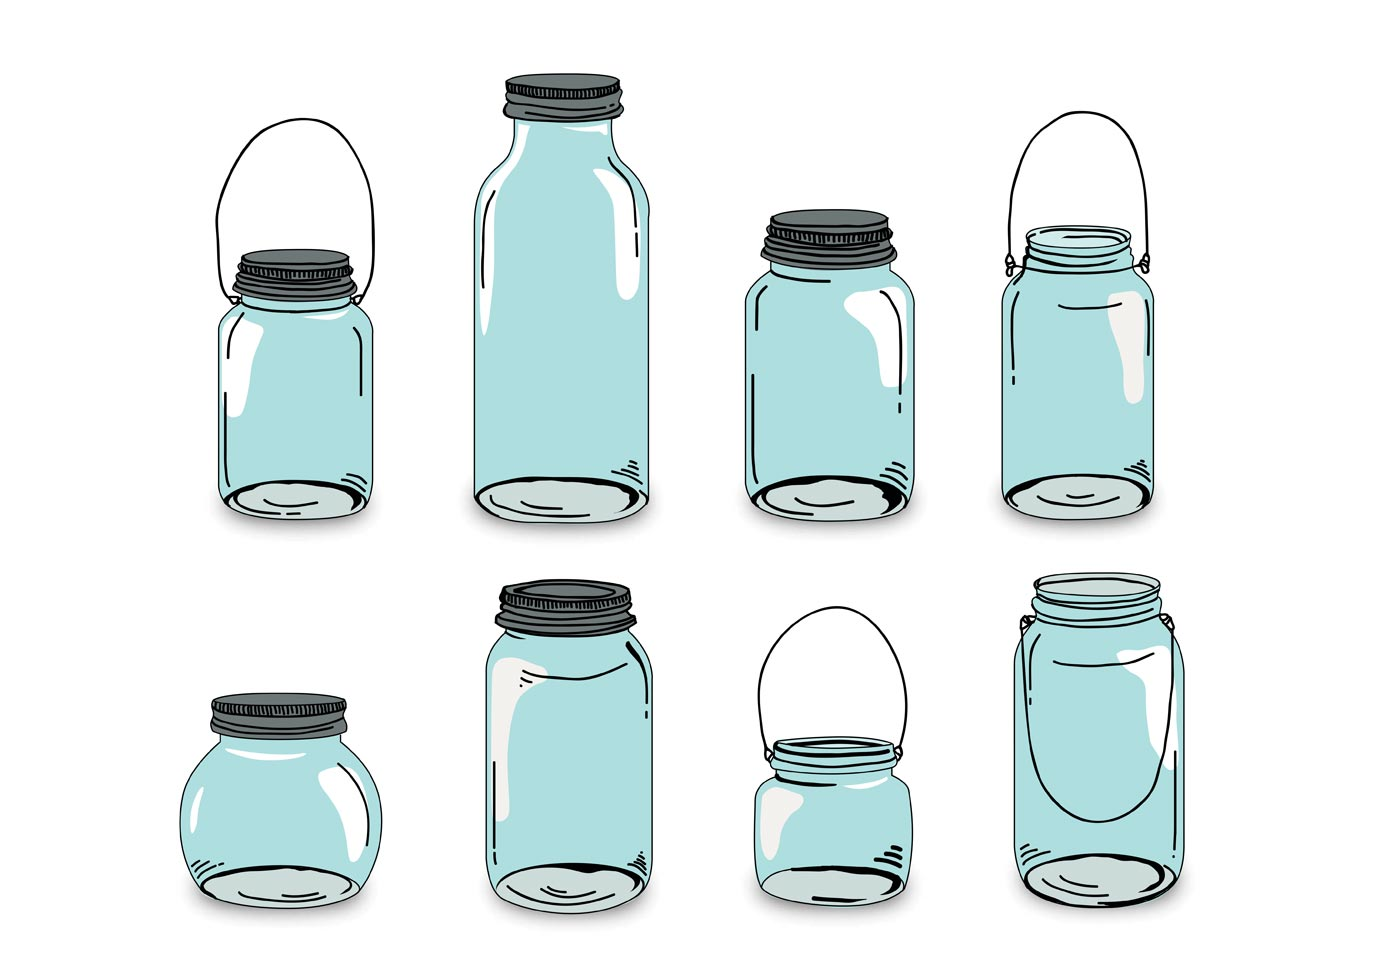 Shabby Chic Mason Jar Free Vector Art - (653 Free Downloads)